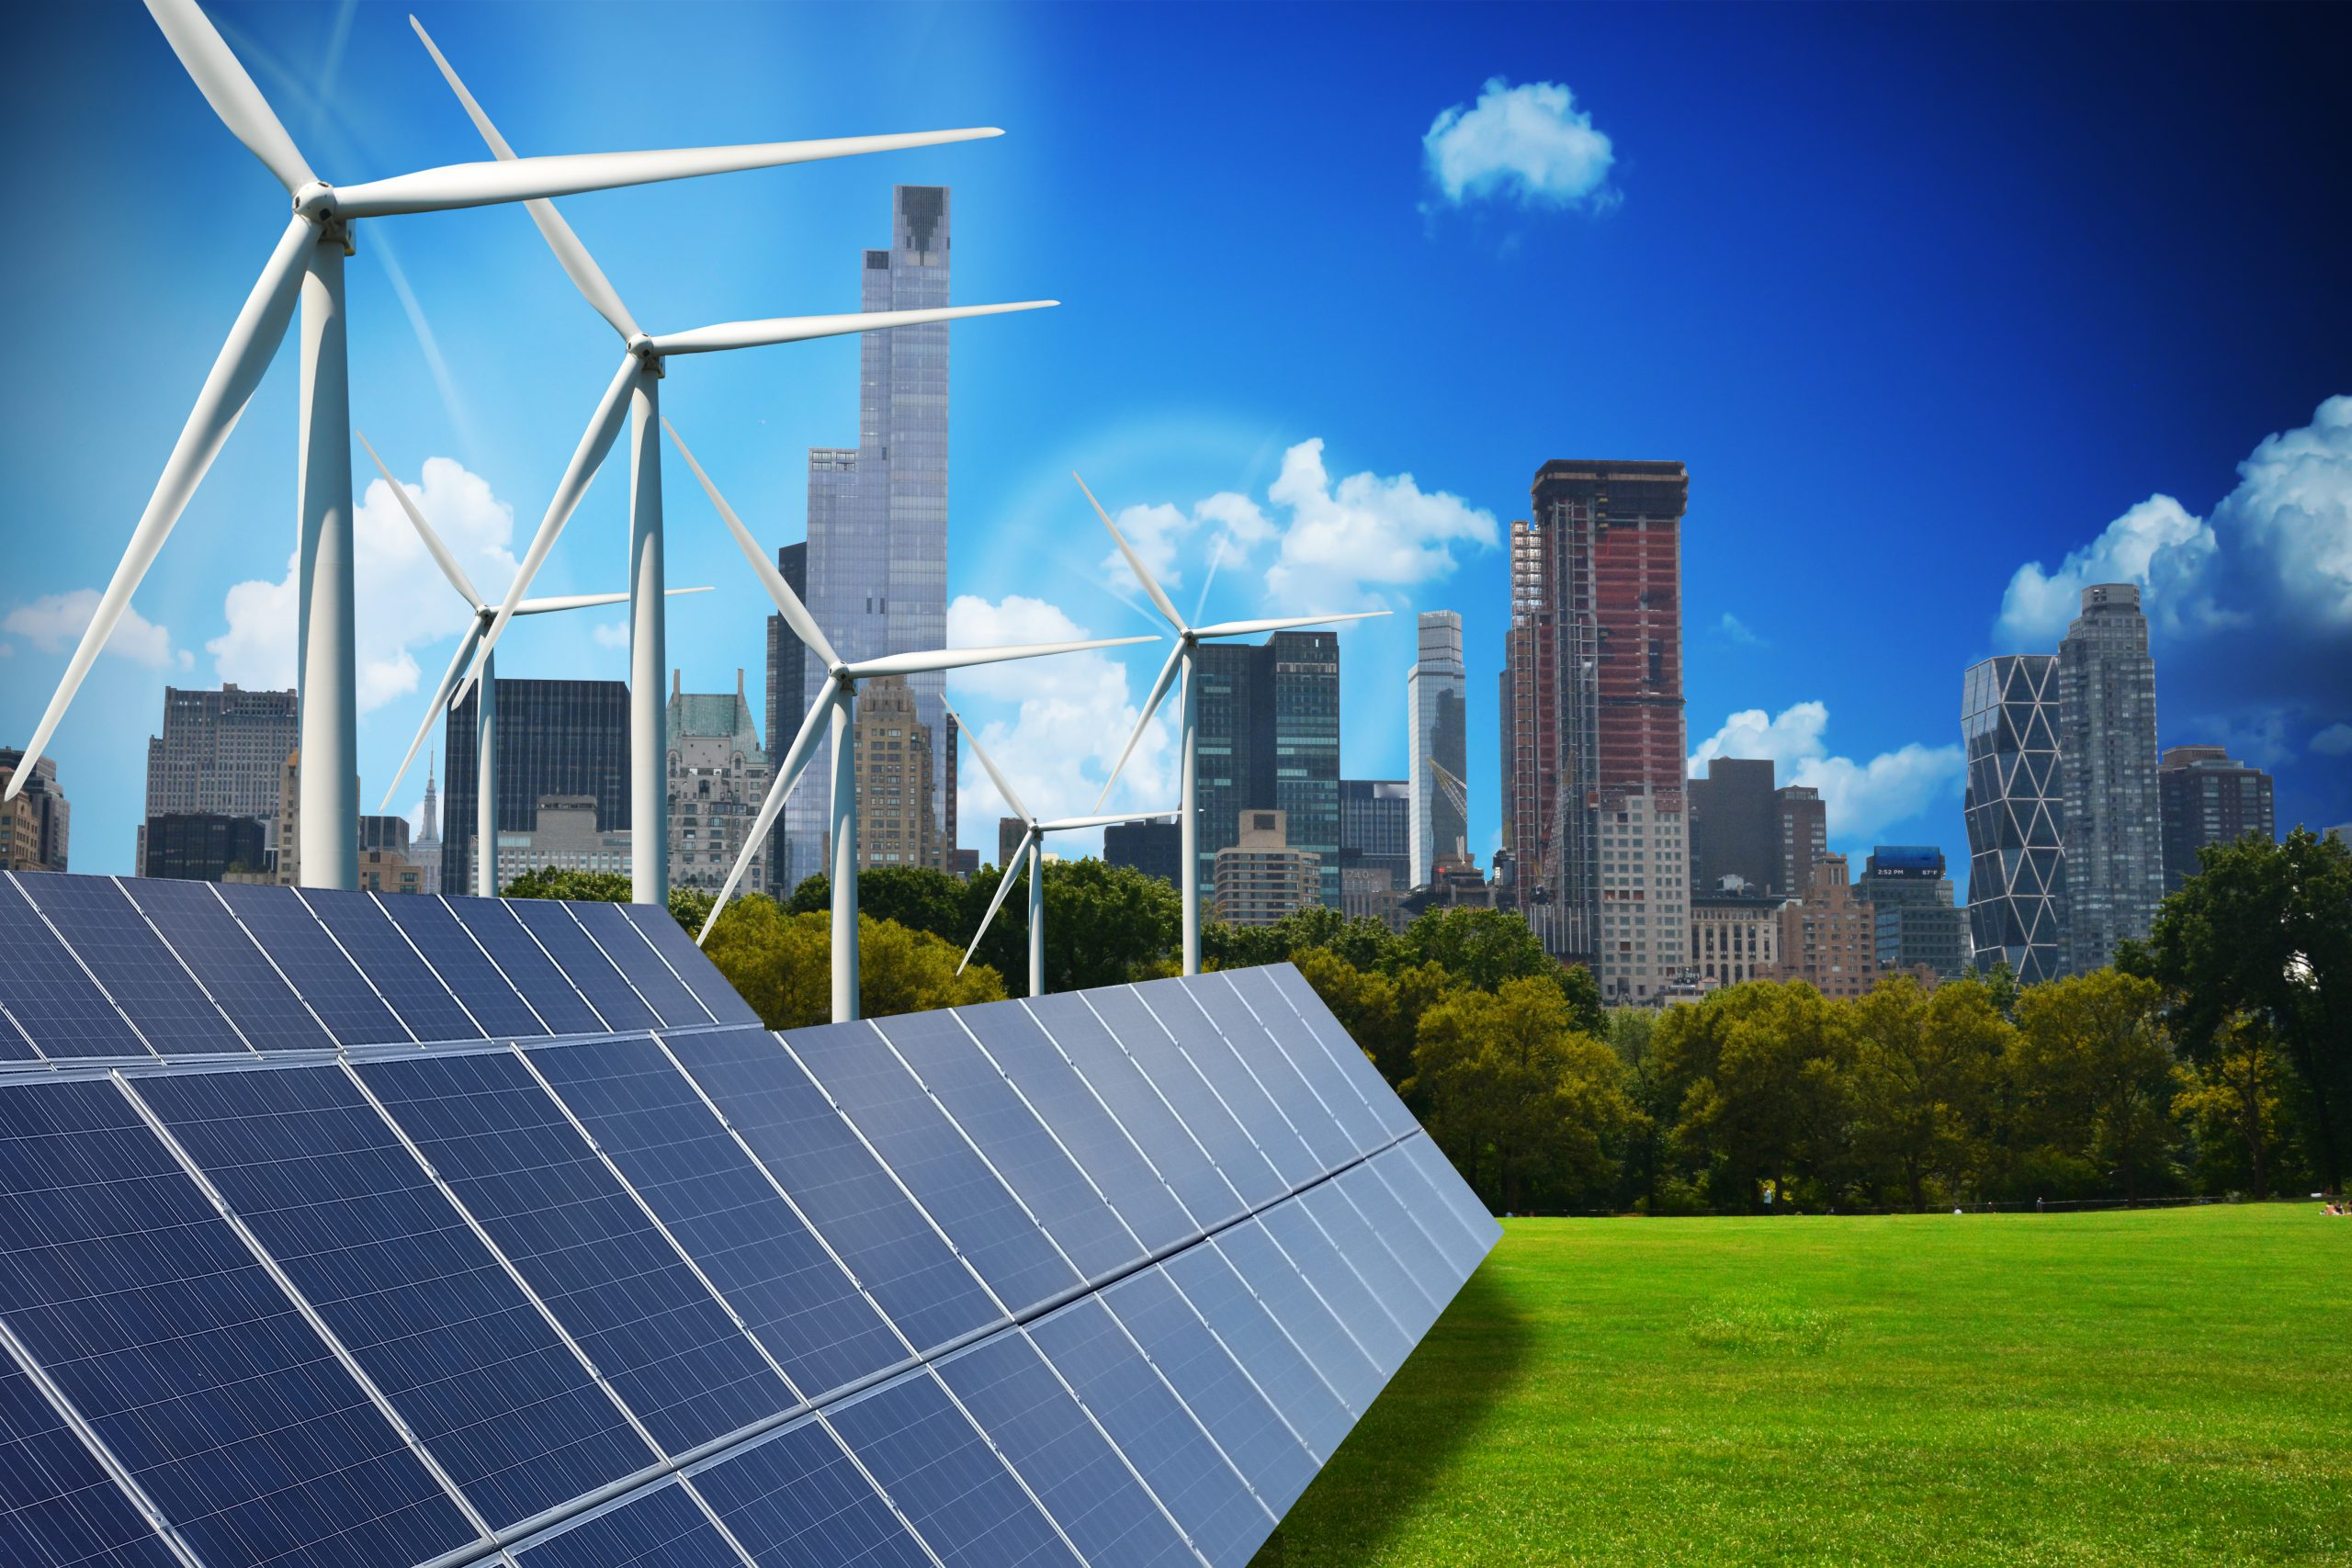 677a2b7d-energetika-oze-fotovoltaika-vitr-shutterstock_553614883-scaled